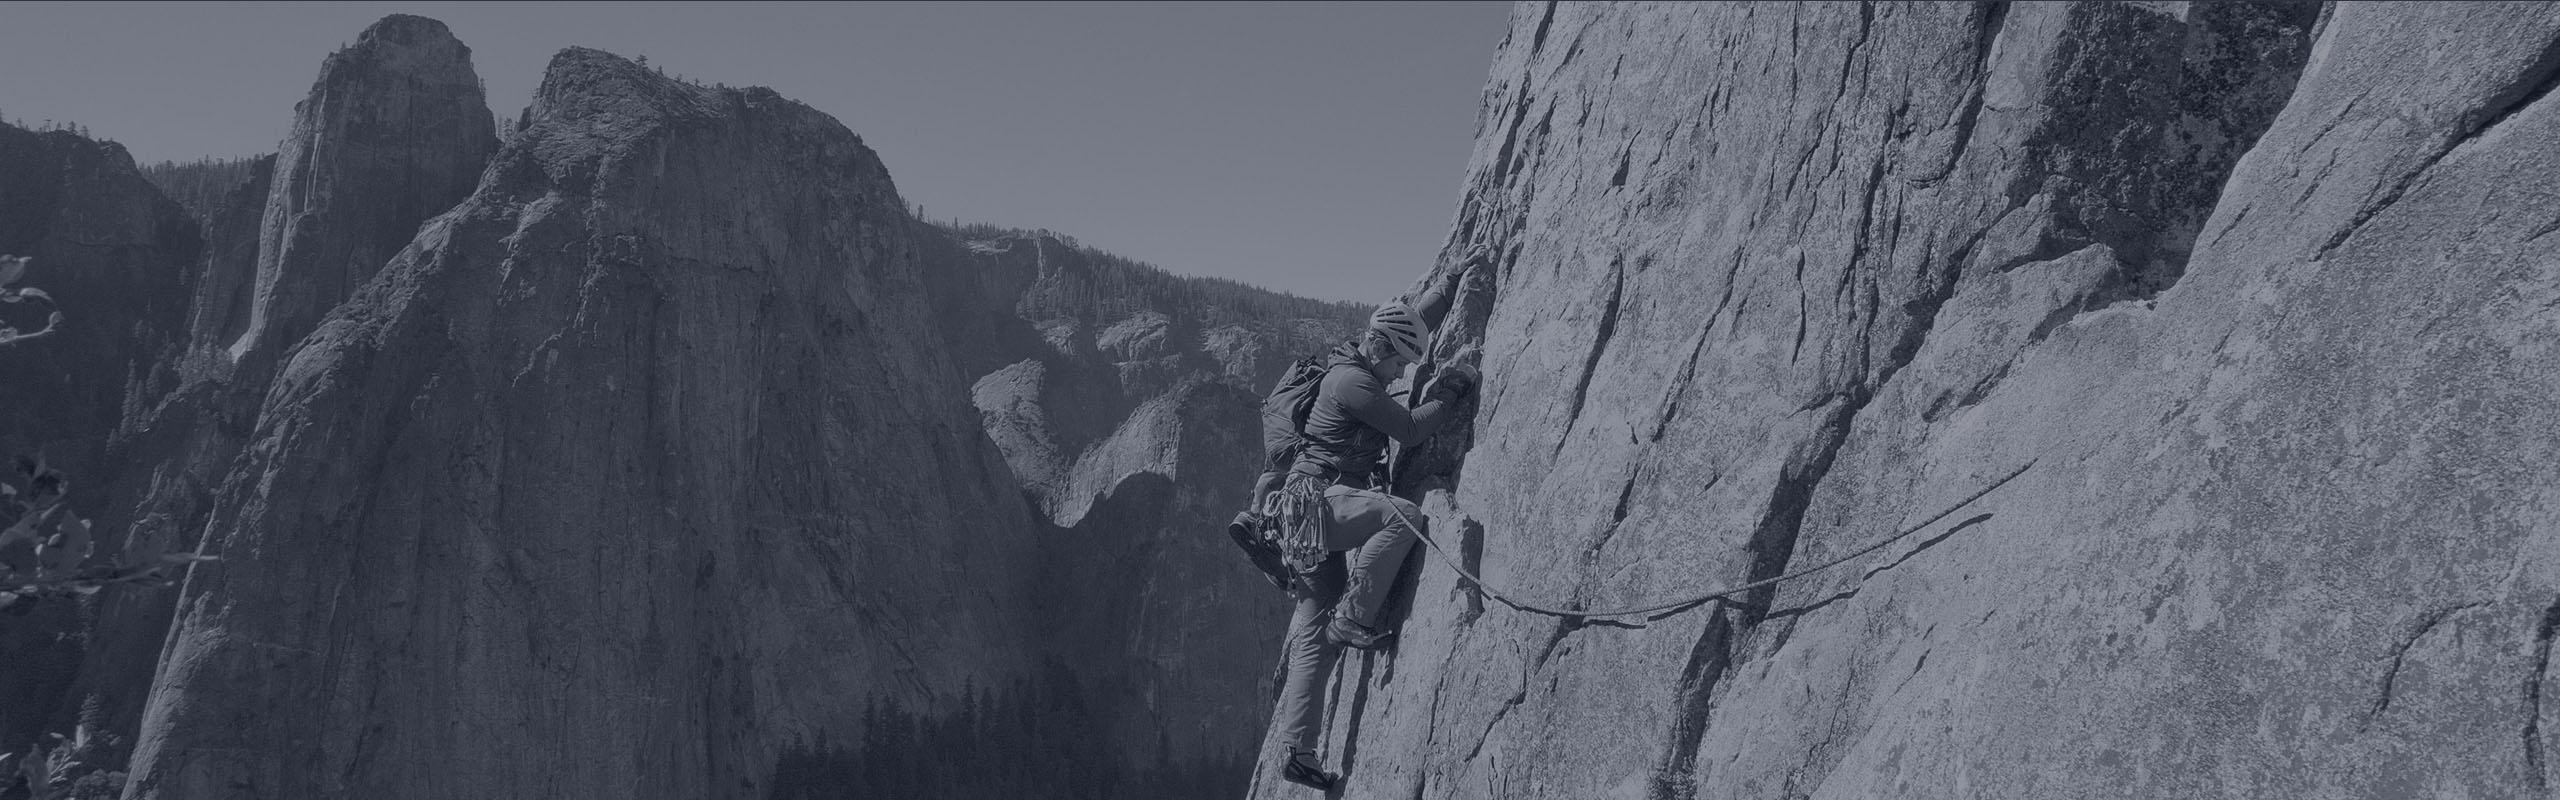 Wspinaczka skalna